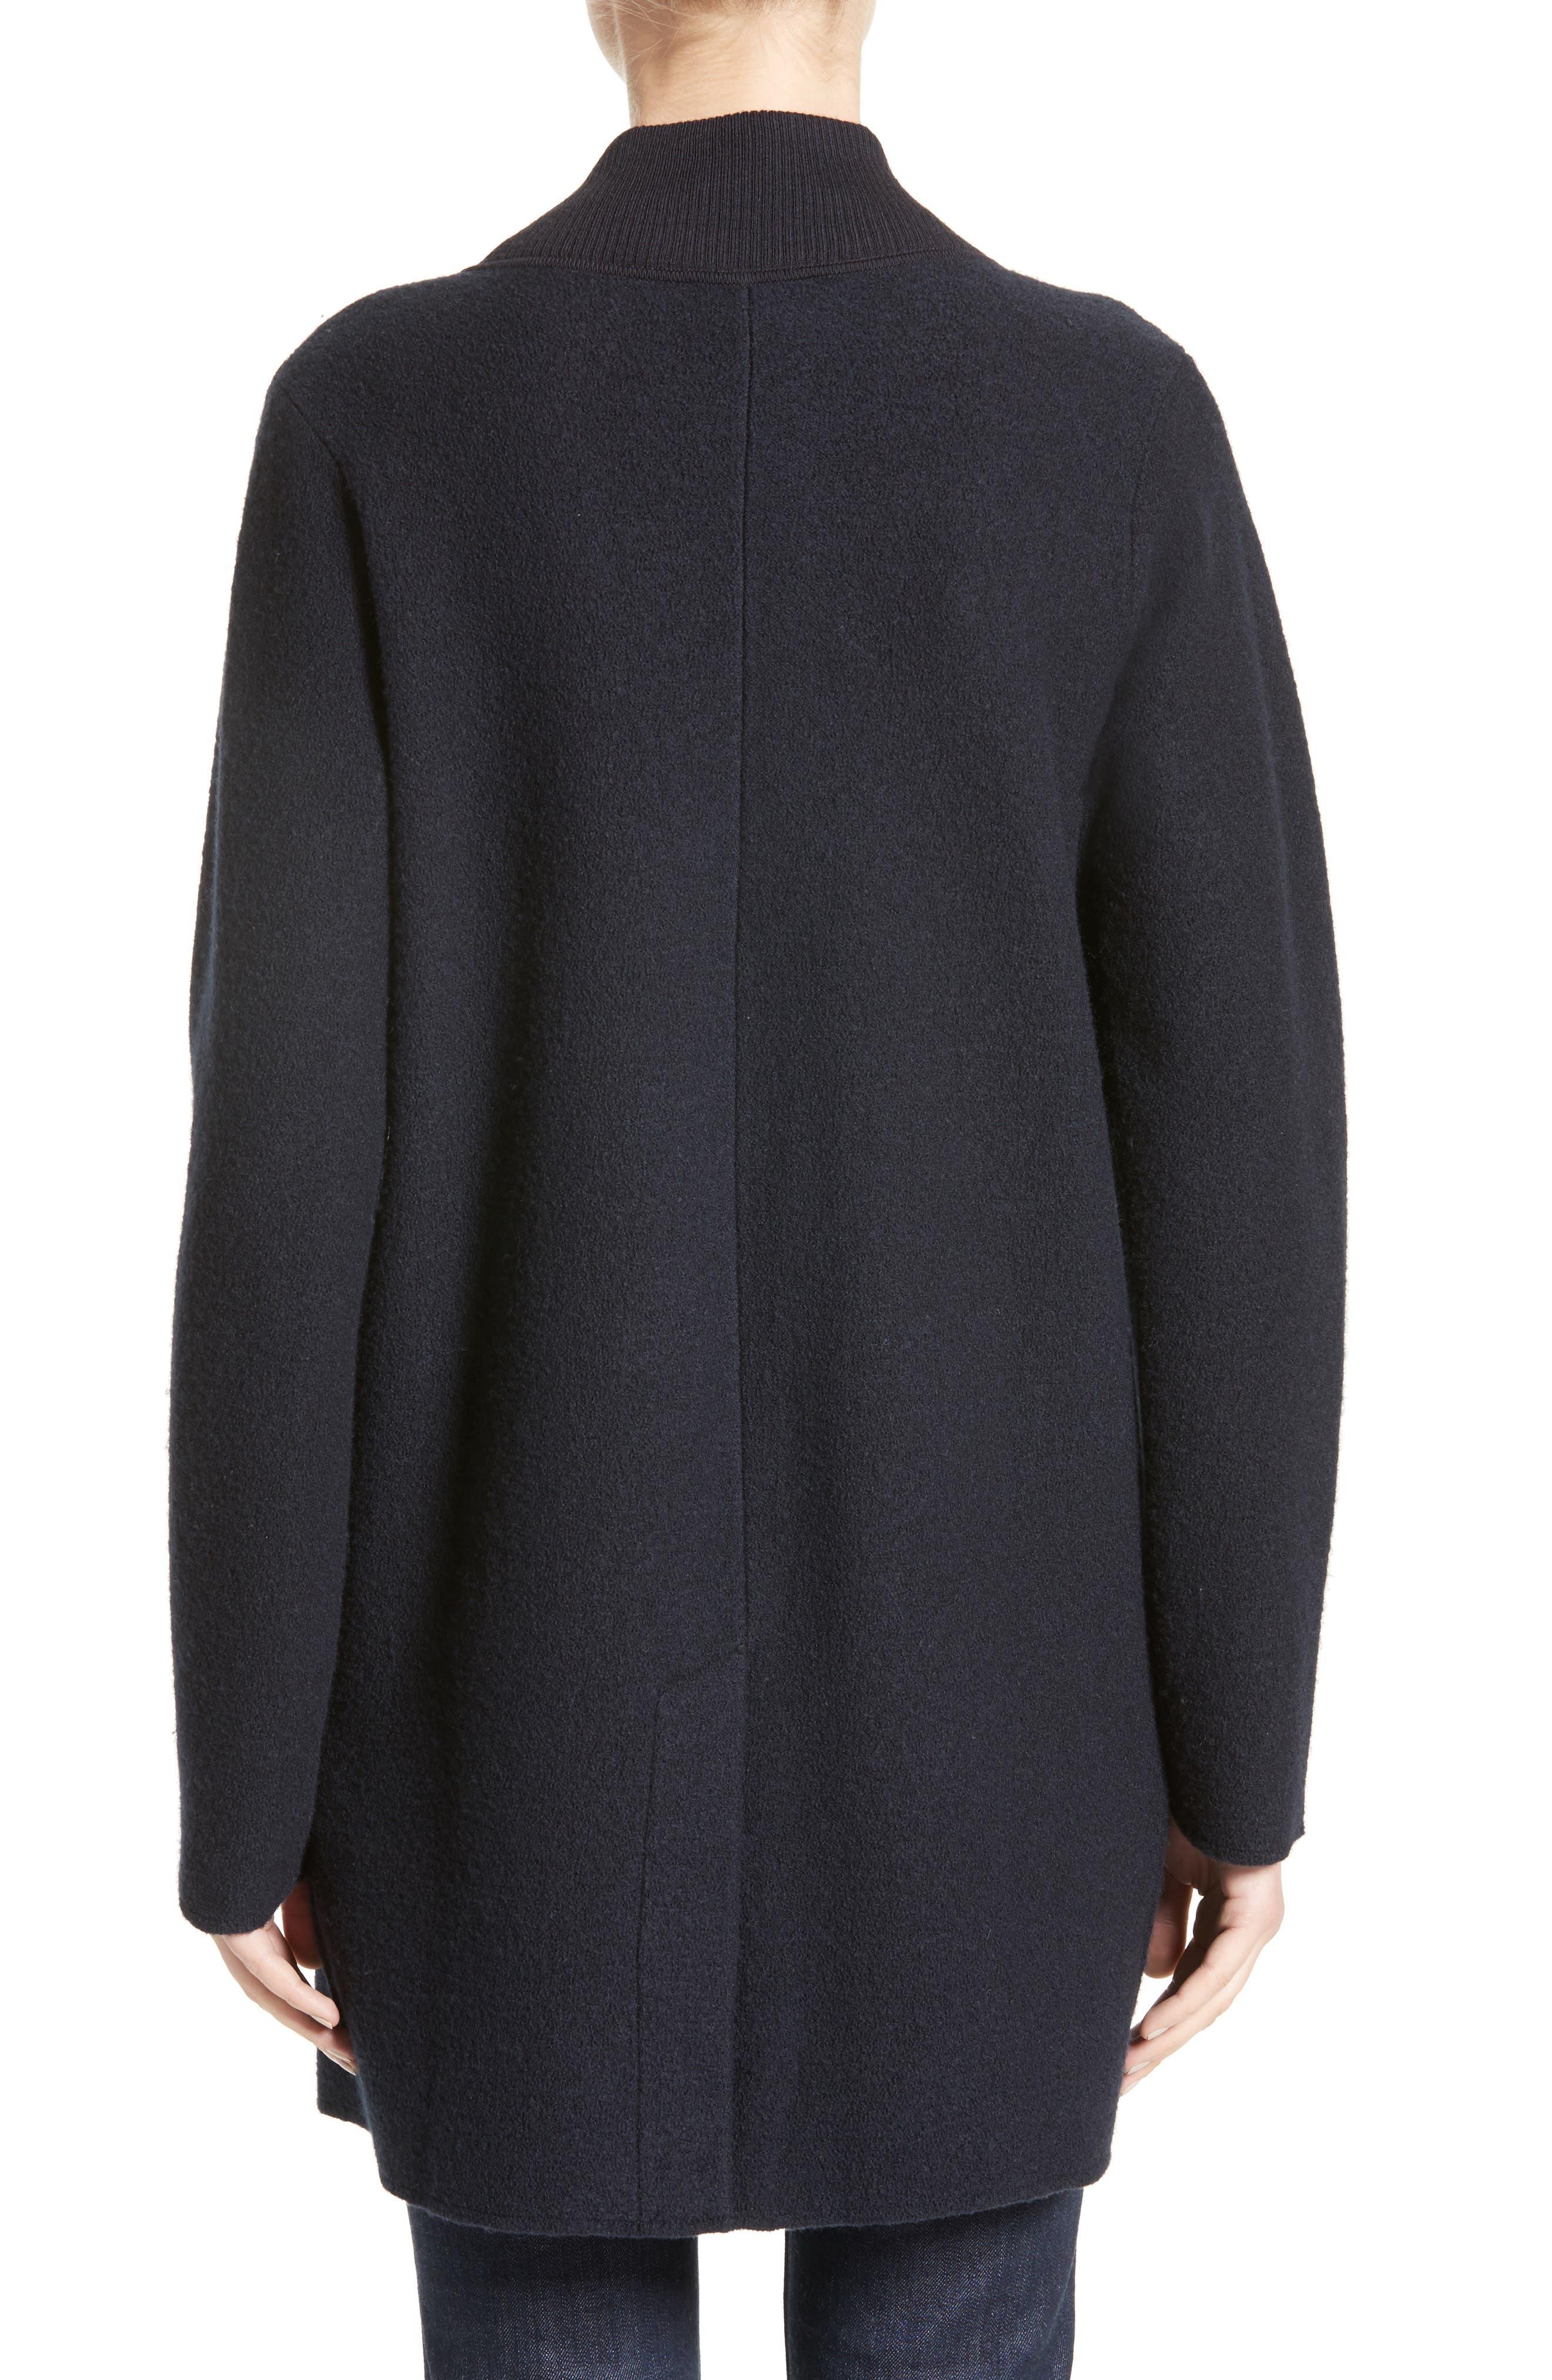 Armani Jeans Single Button Wool Coat,                             Alternate thumbnail 2, color,                             Navy